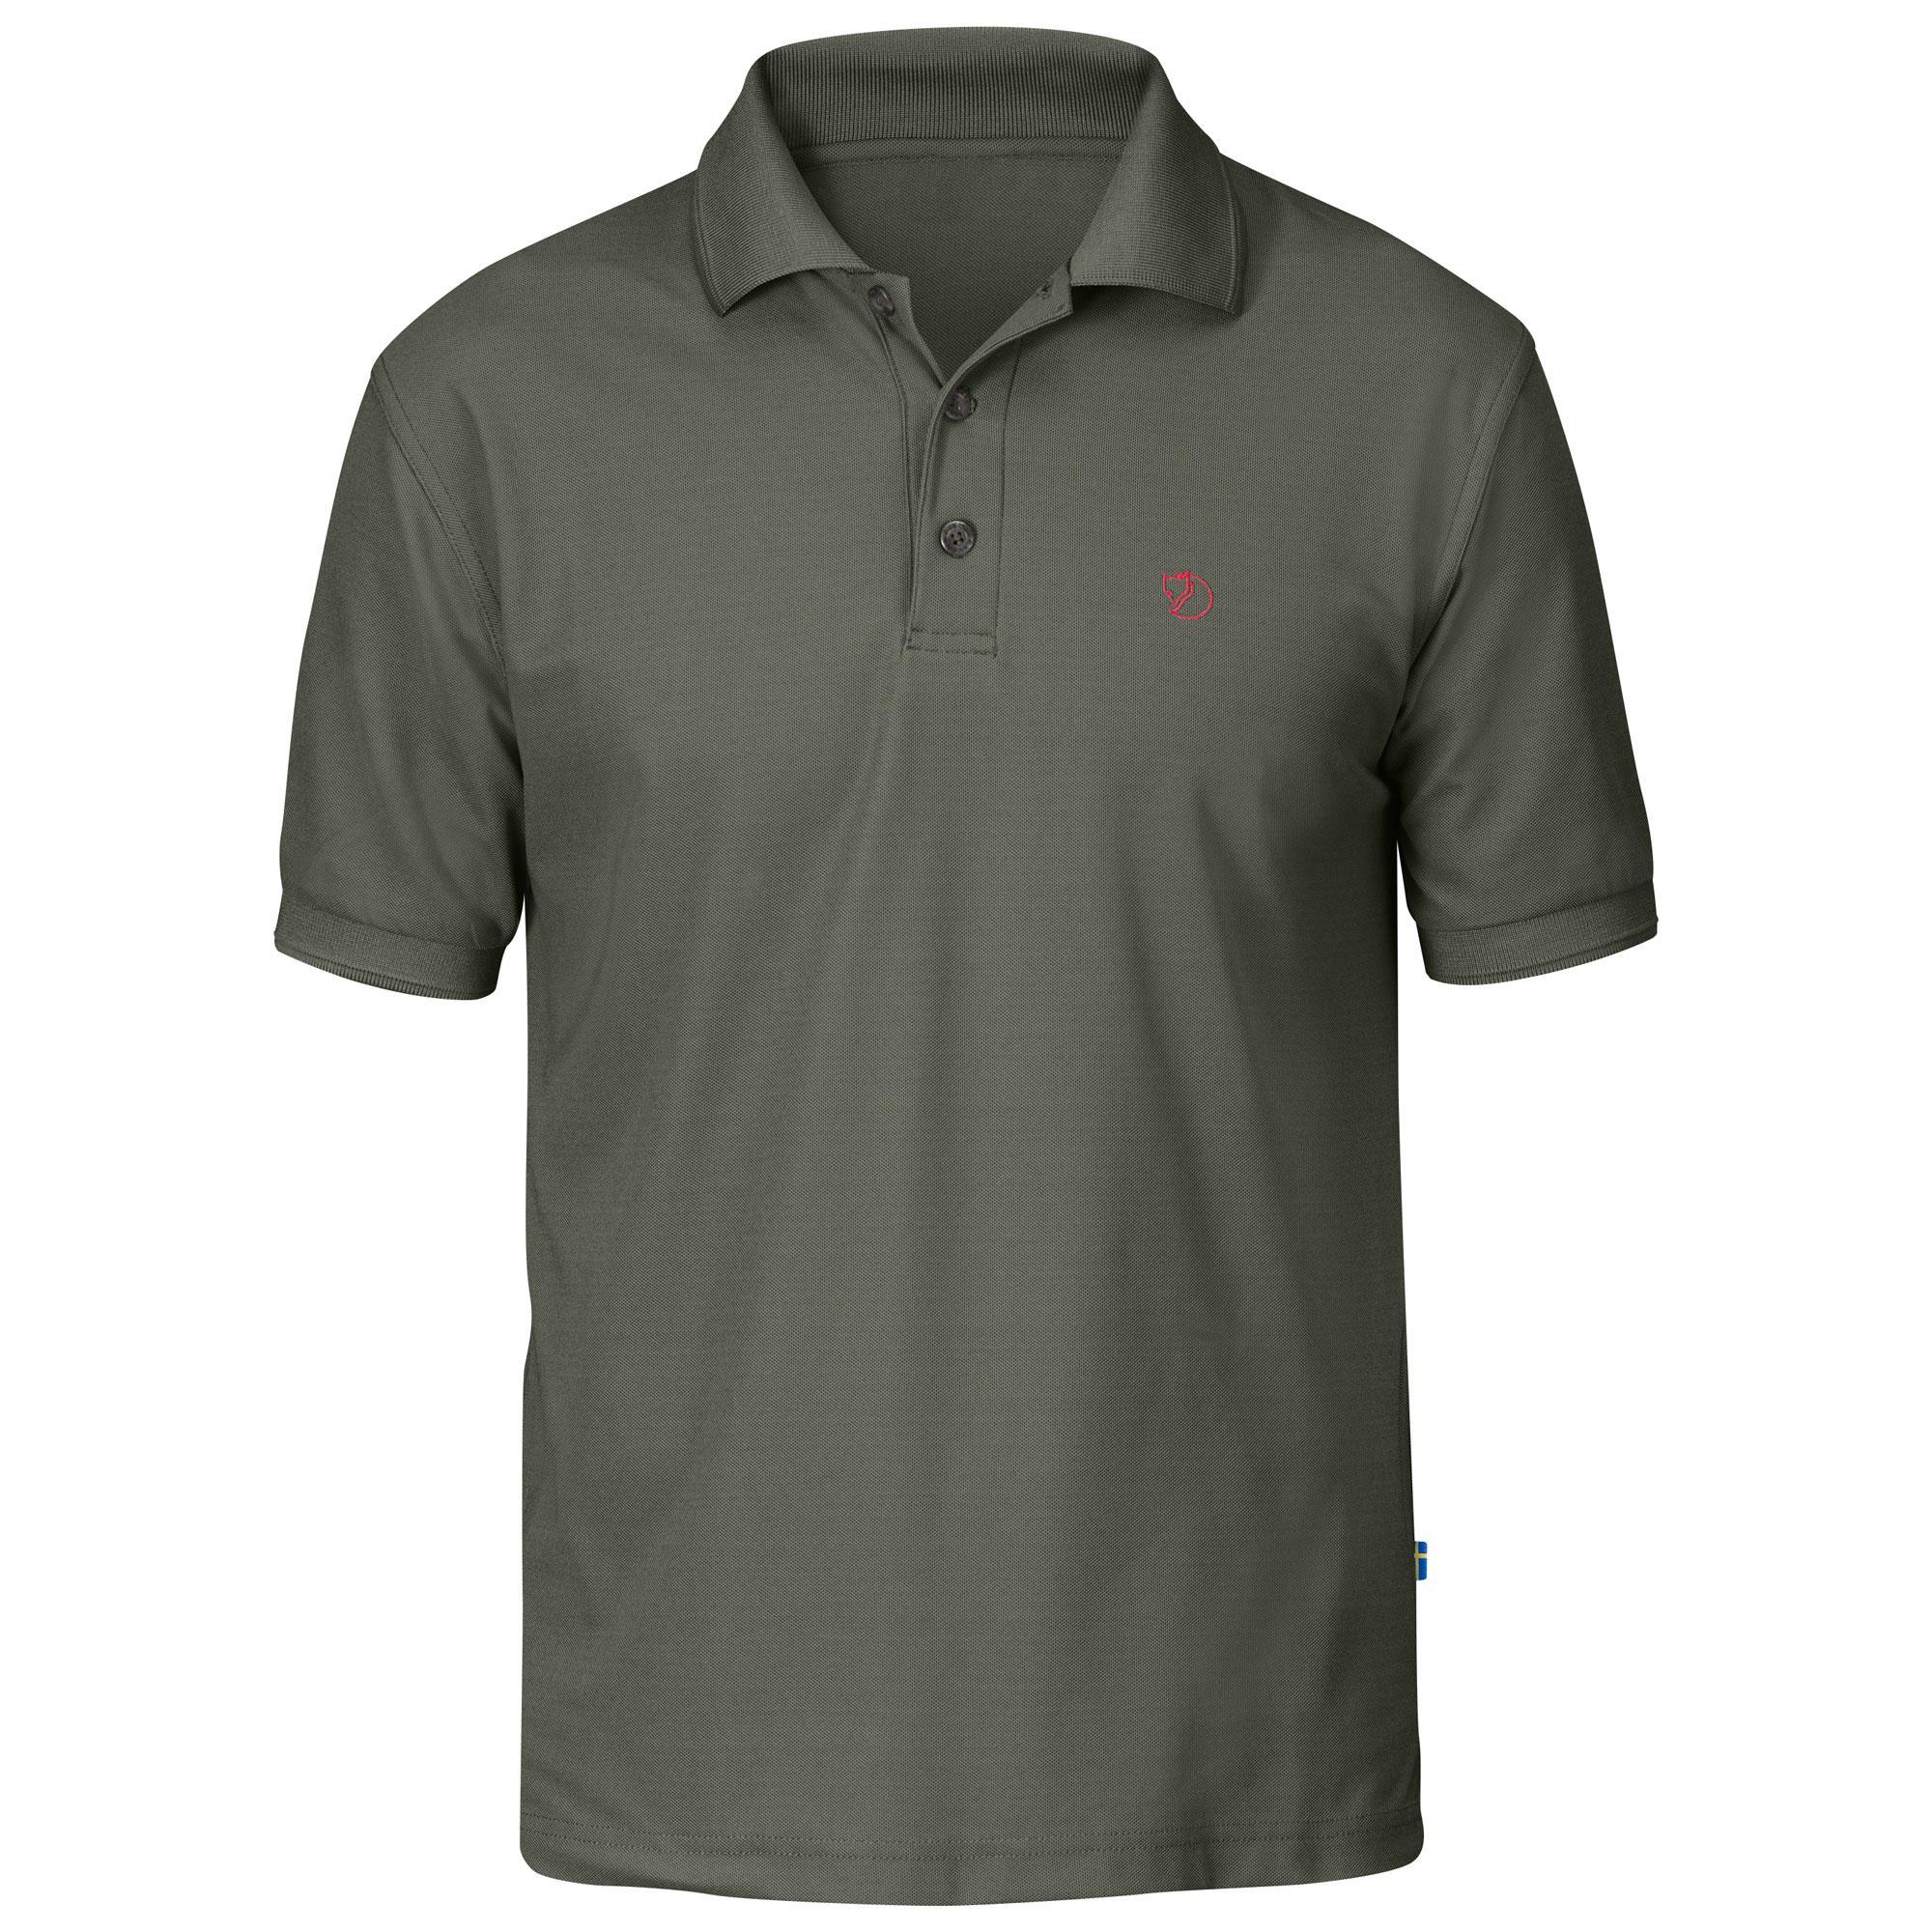 Fjällräven Crowley Pique Polo Shirt Men - Funktionsshirt - mountain grey 032 - Gr.M